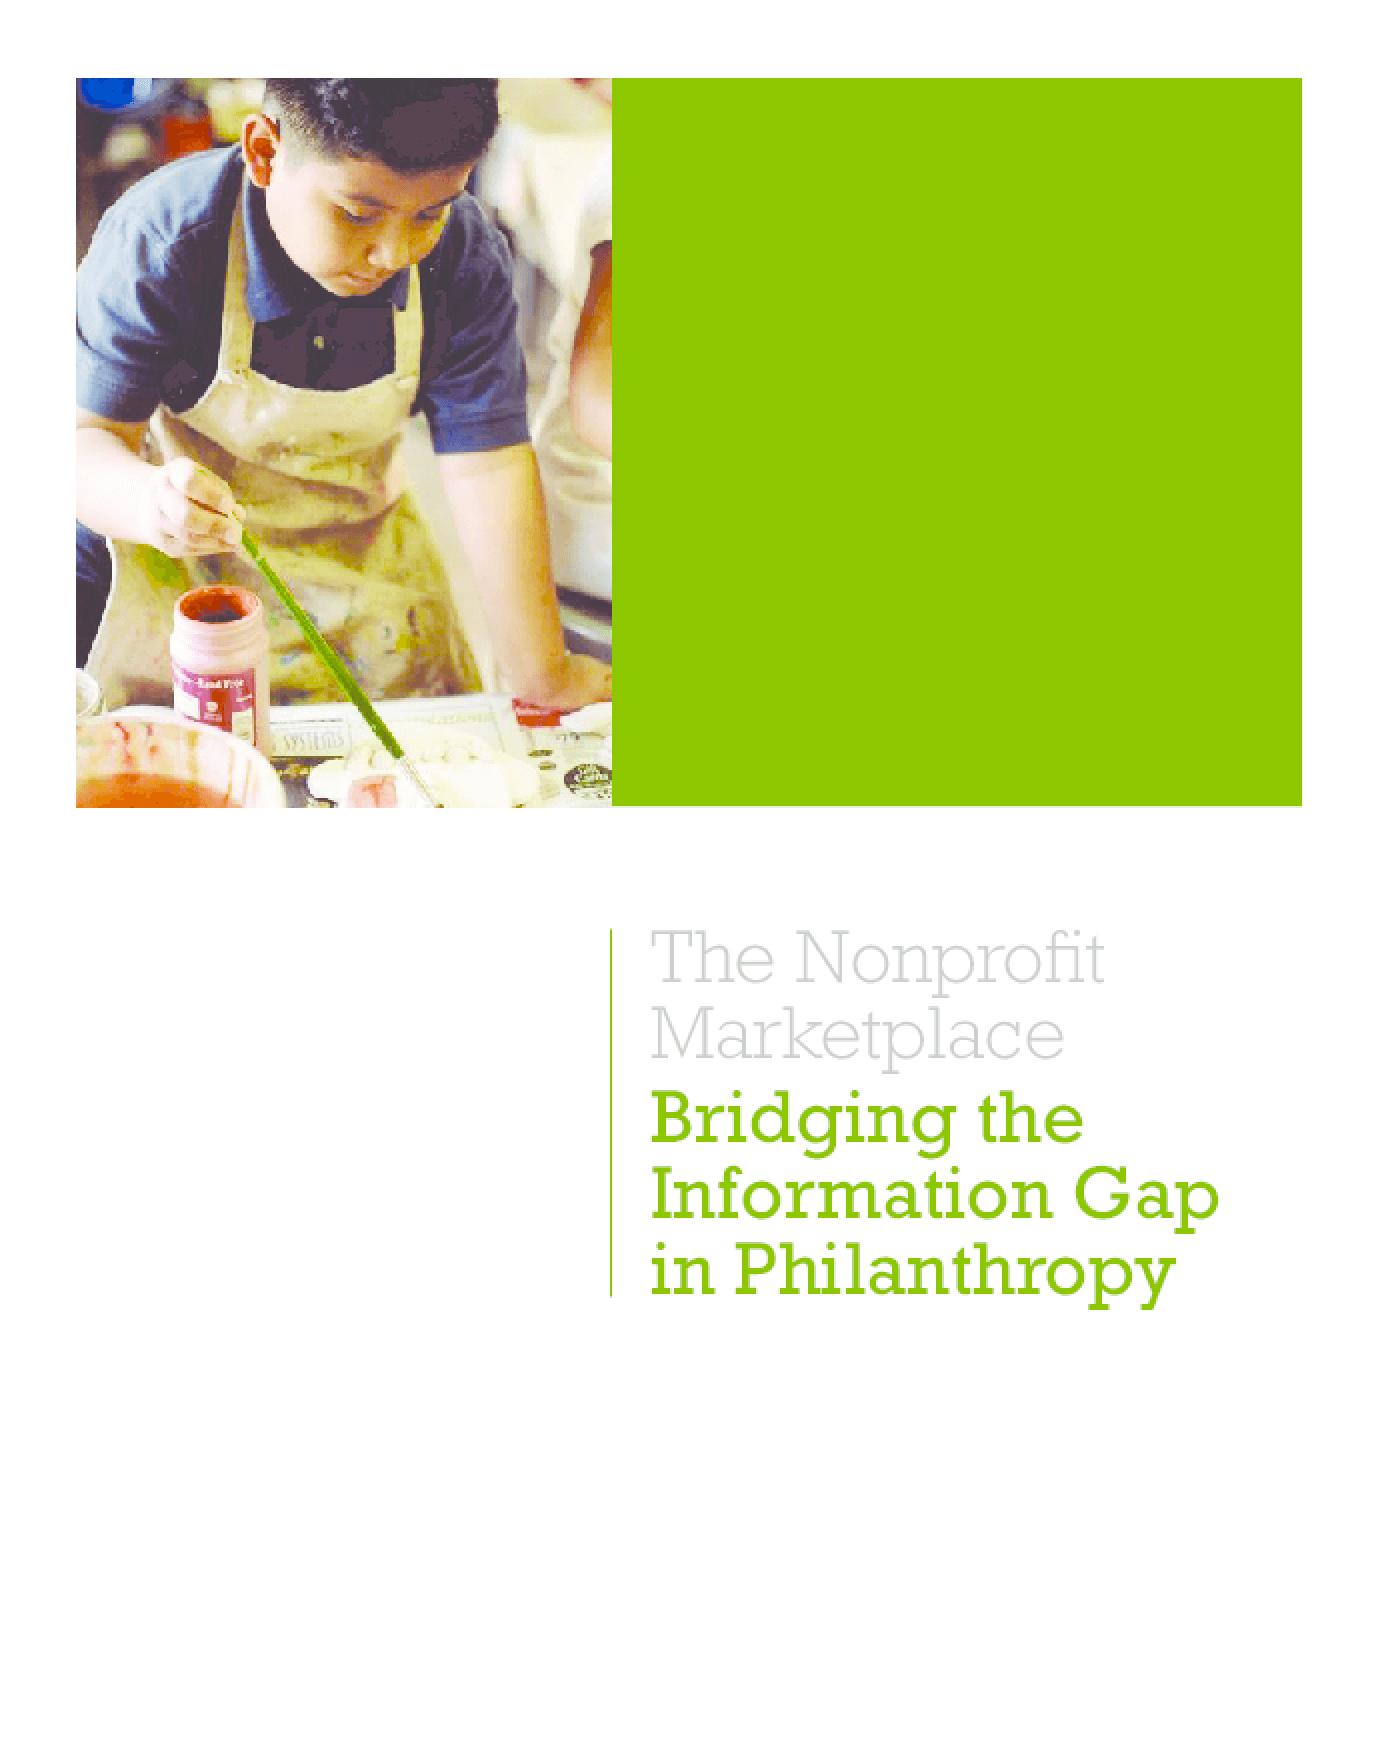 The Nonprofit Marketplace: Bridging the Information Gap in Philanthropy